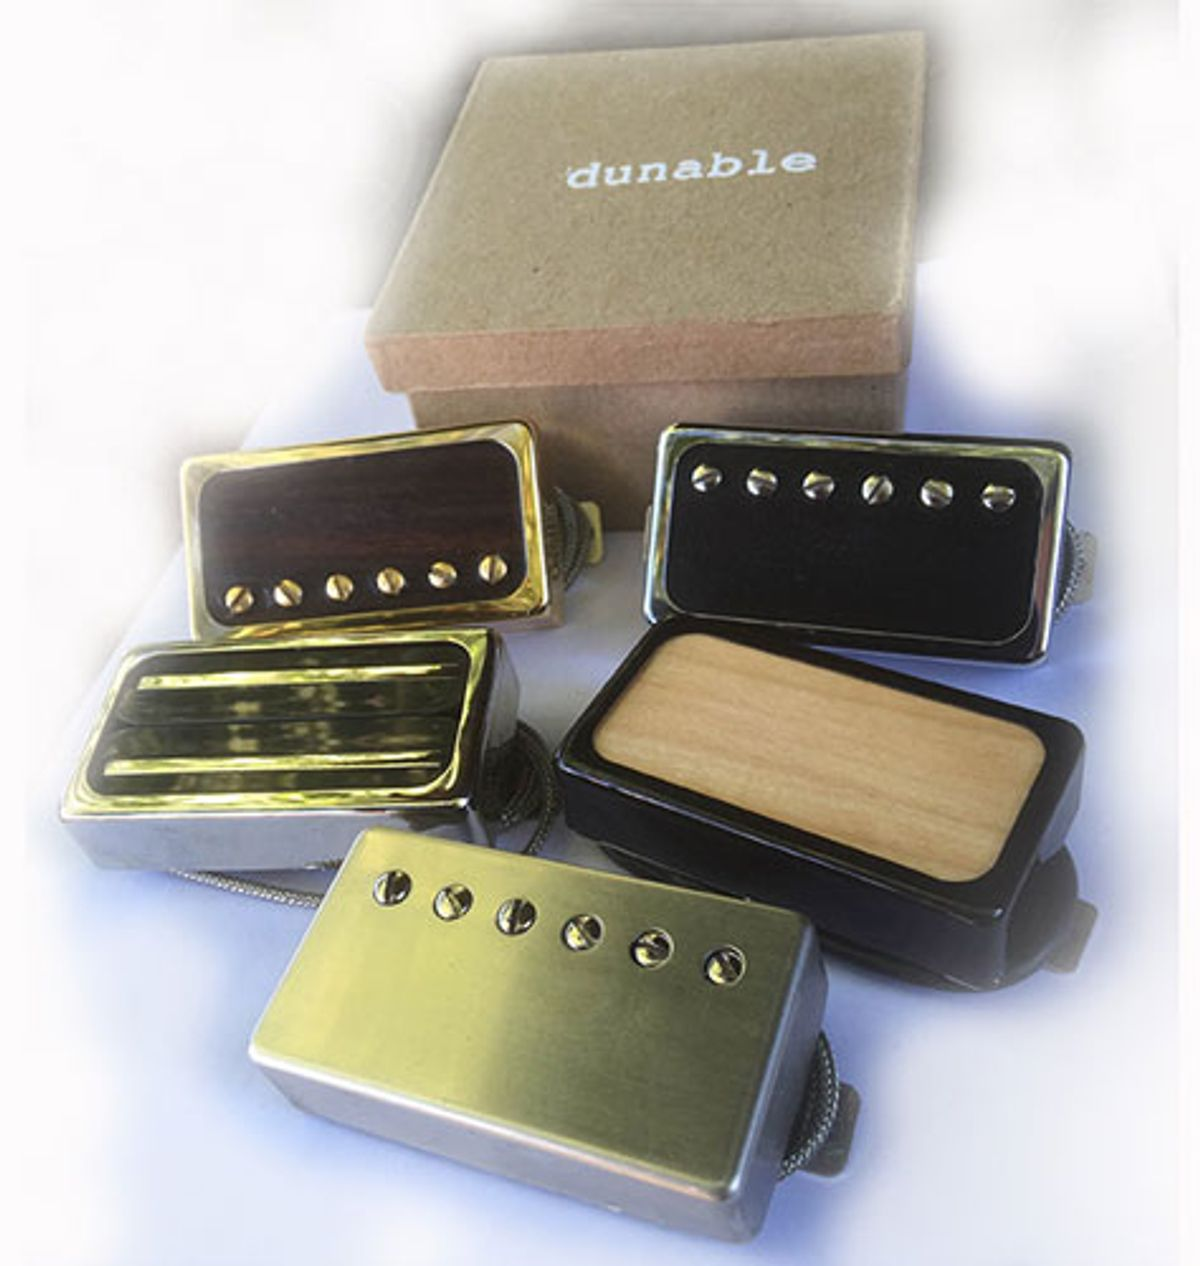 Dunable Guitars Announces Line of Guitar Pickups